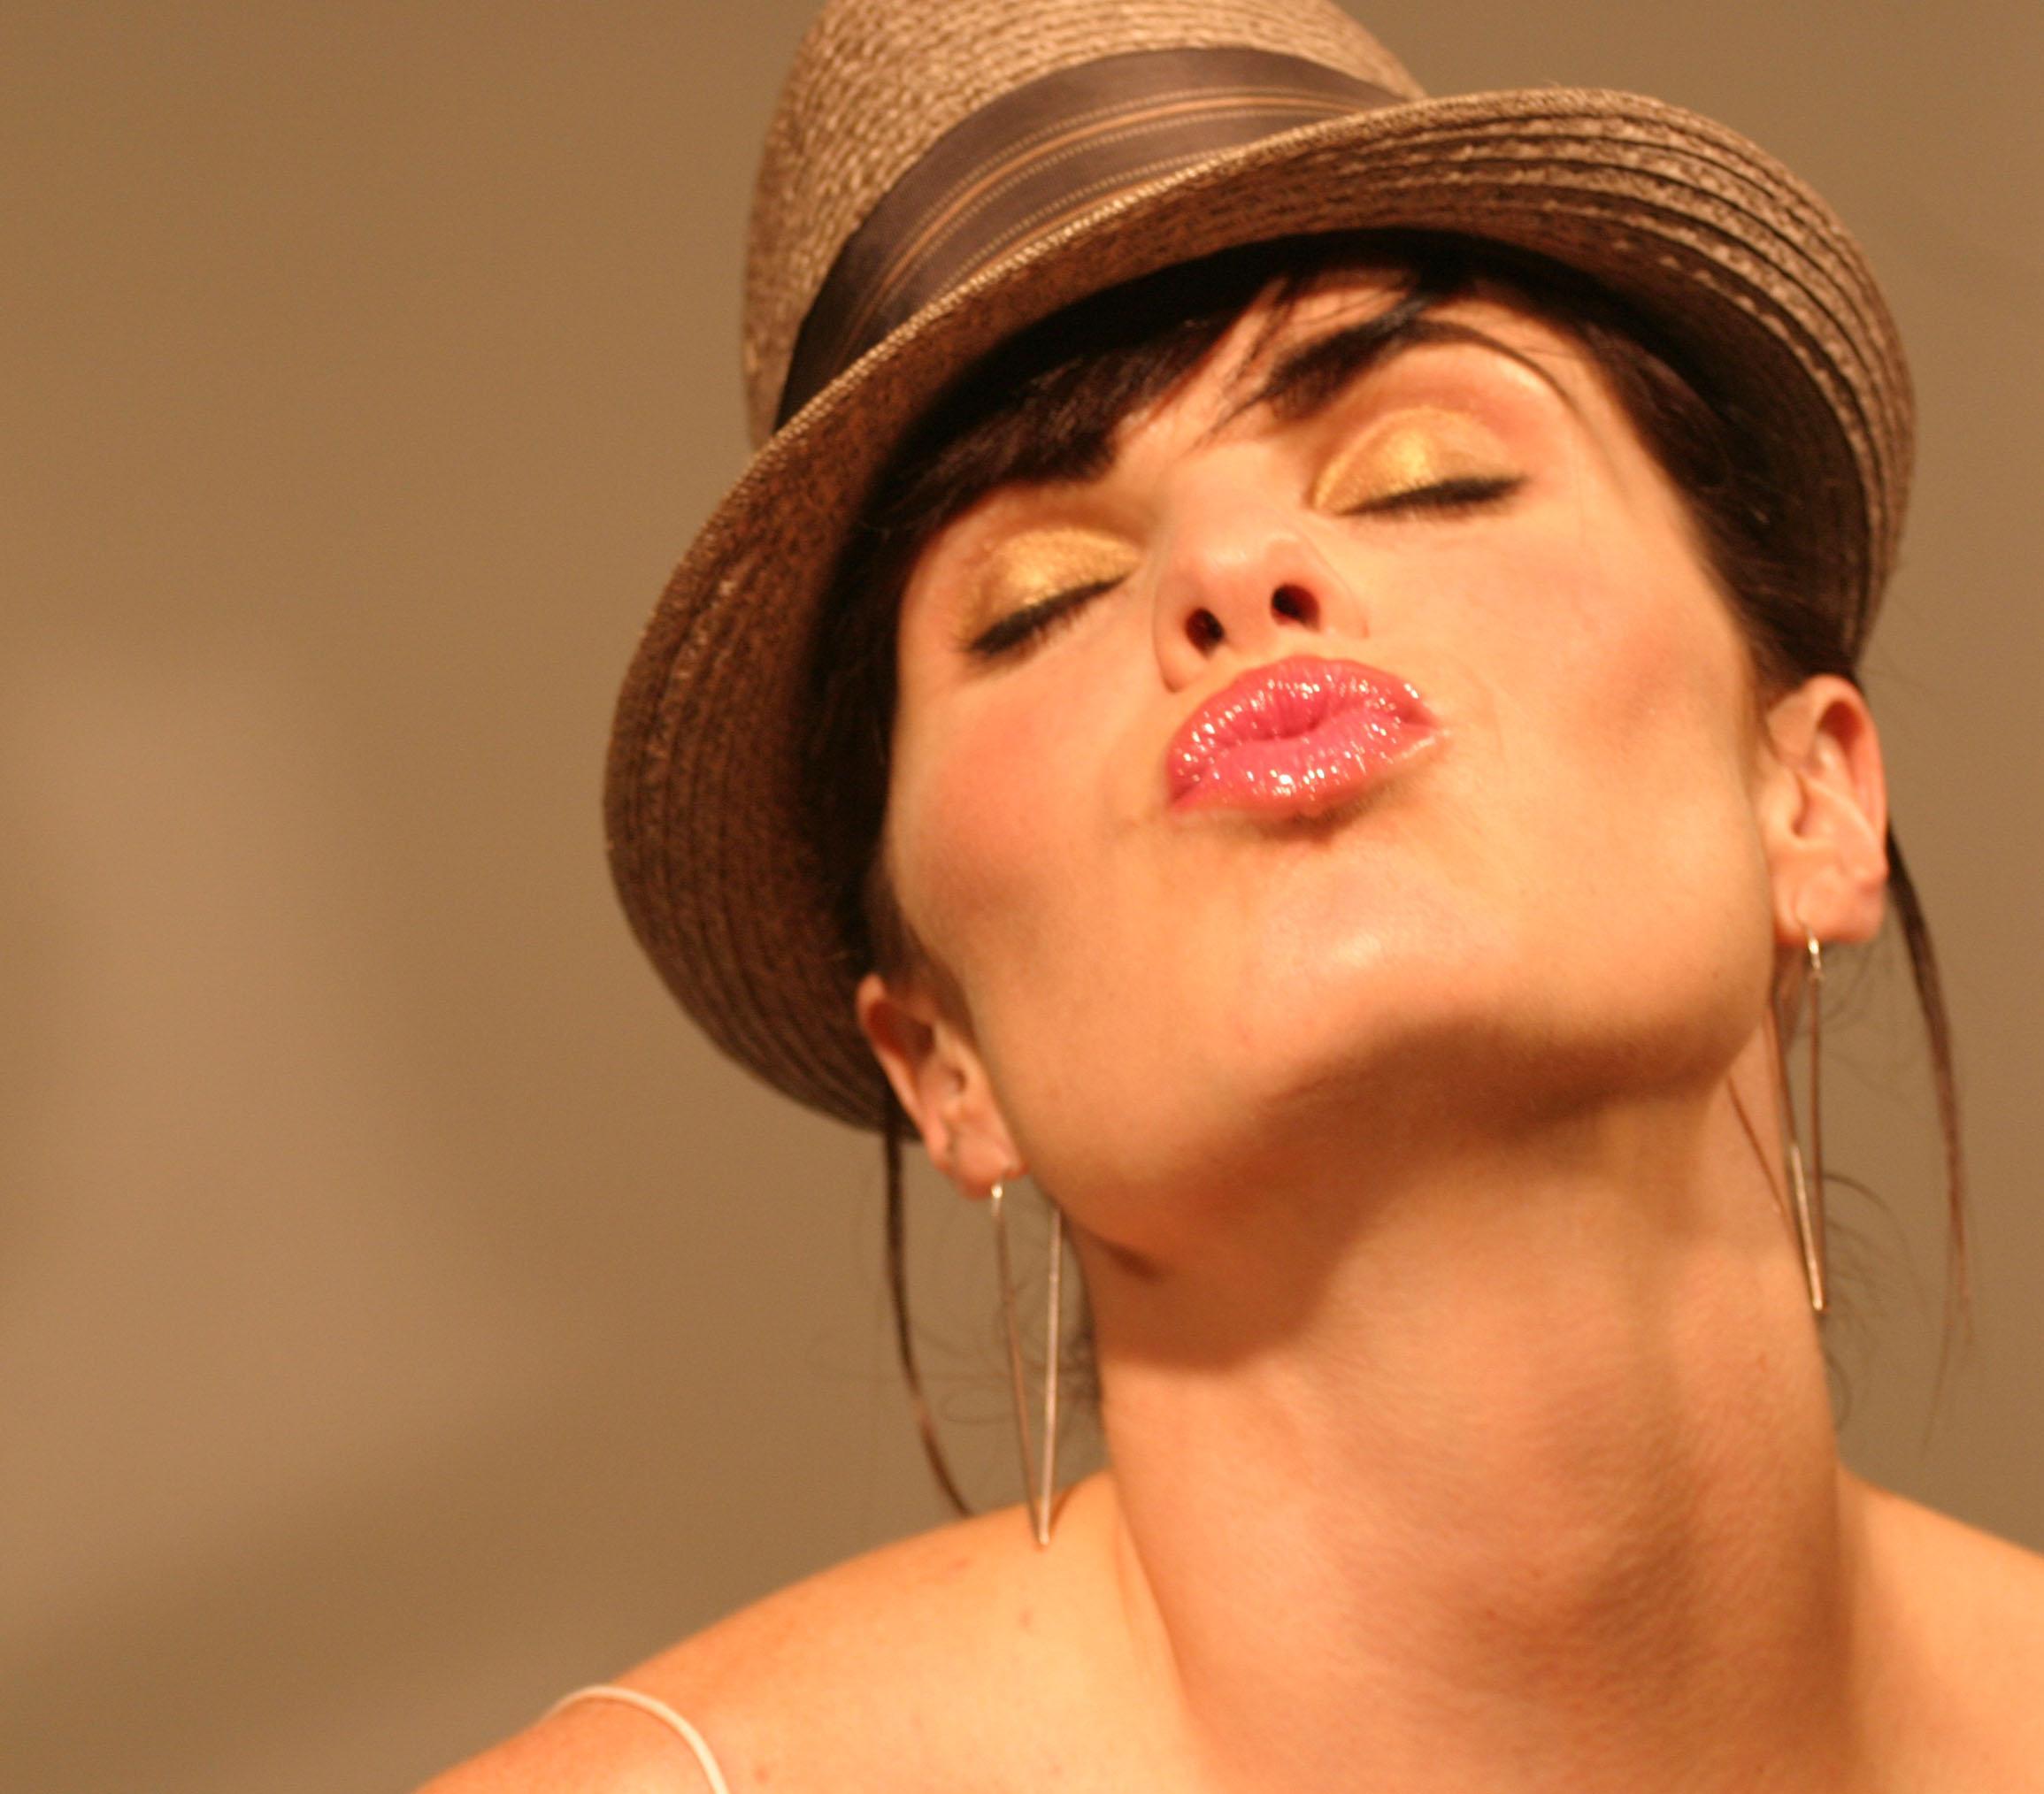 quincy+kiss.jpg